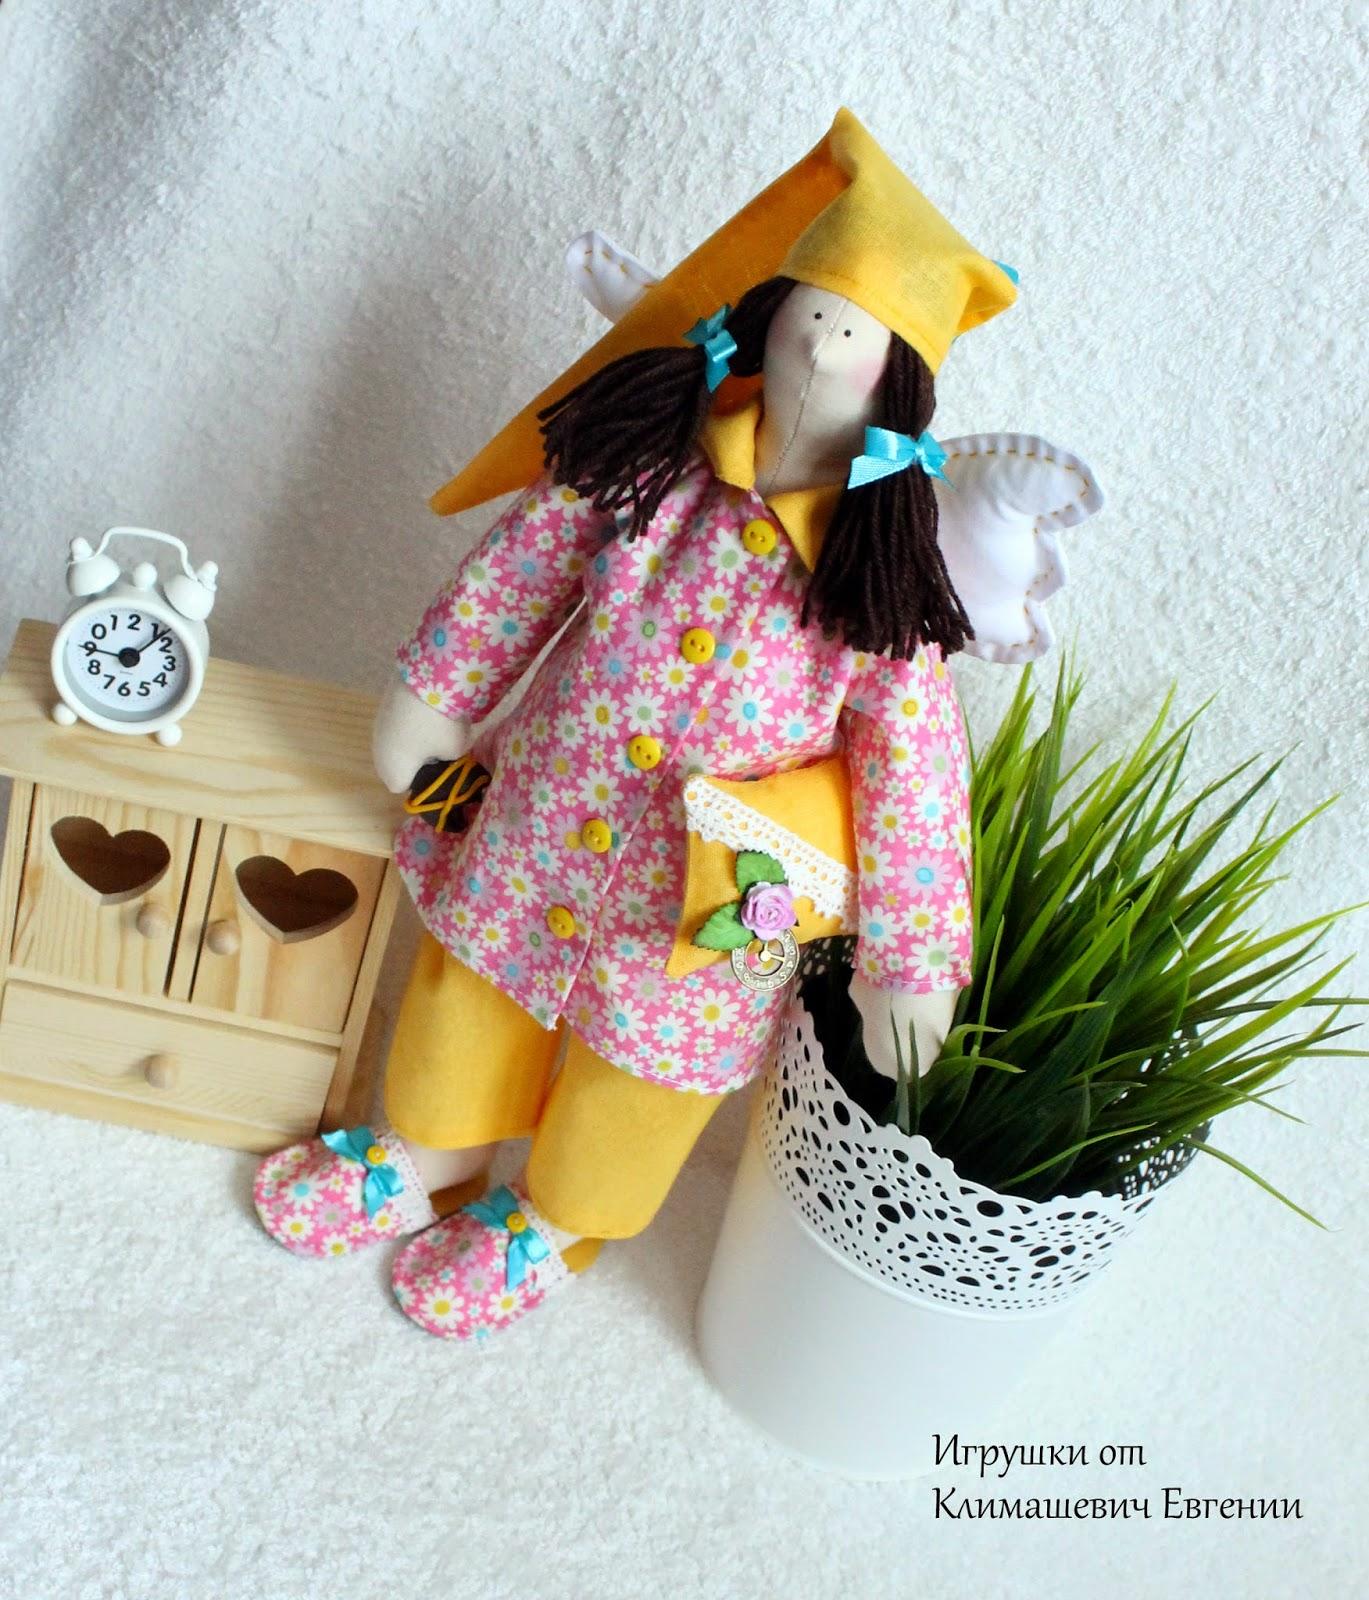 Тильда, кукла тильда, тильда ангел, ангел, сонный ангел, спящий ангел, сплюшка, сплюшкин, тильда сплюшка, сплюх, тильда сплюх, кукла, игрушка, кукла текстильная, интерьерная кукла, интерьерная игрушка, авторская игрушка, подарок